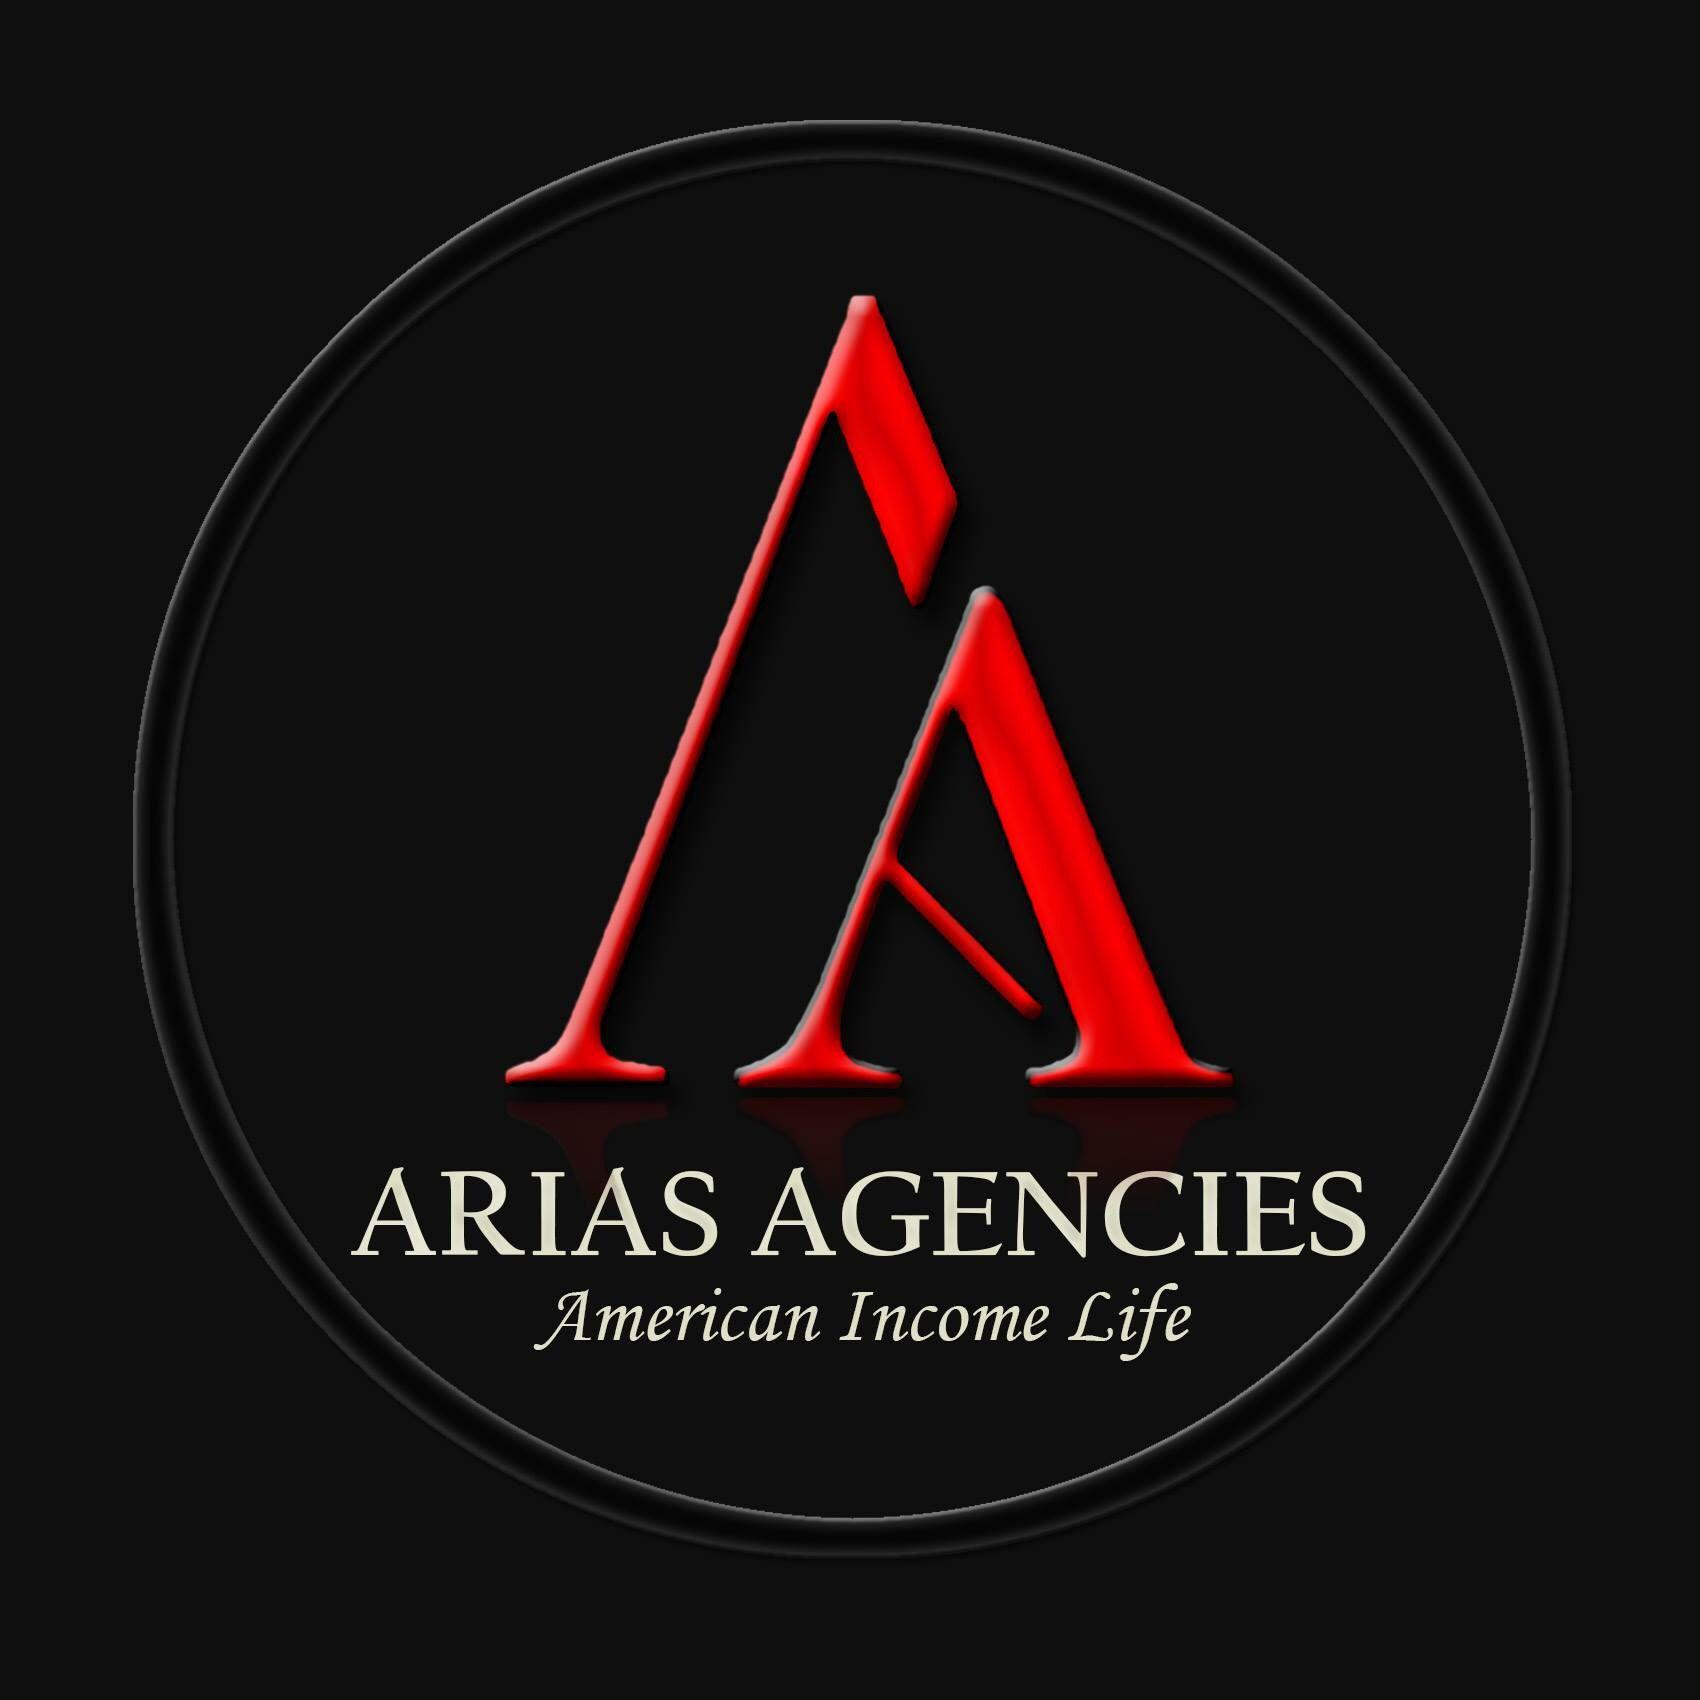 Arias Agencies Jax Life Gaming Logos Life Changes